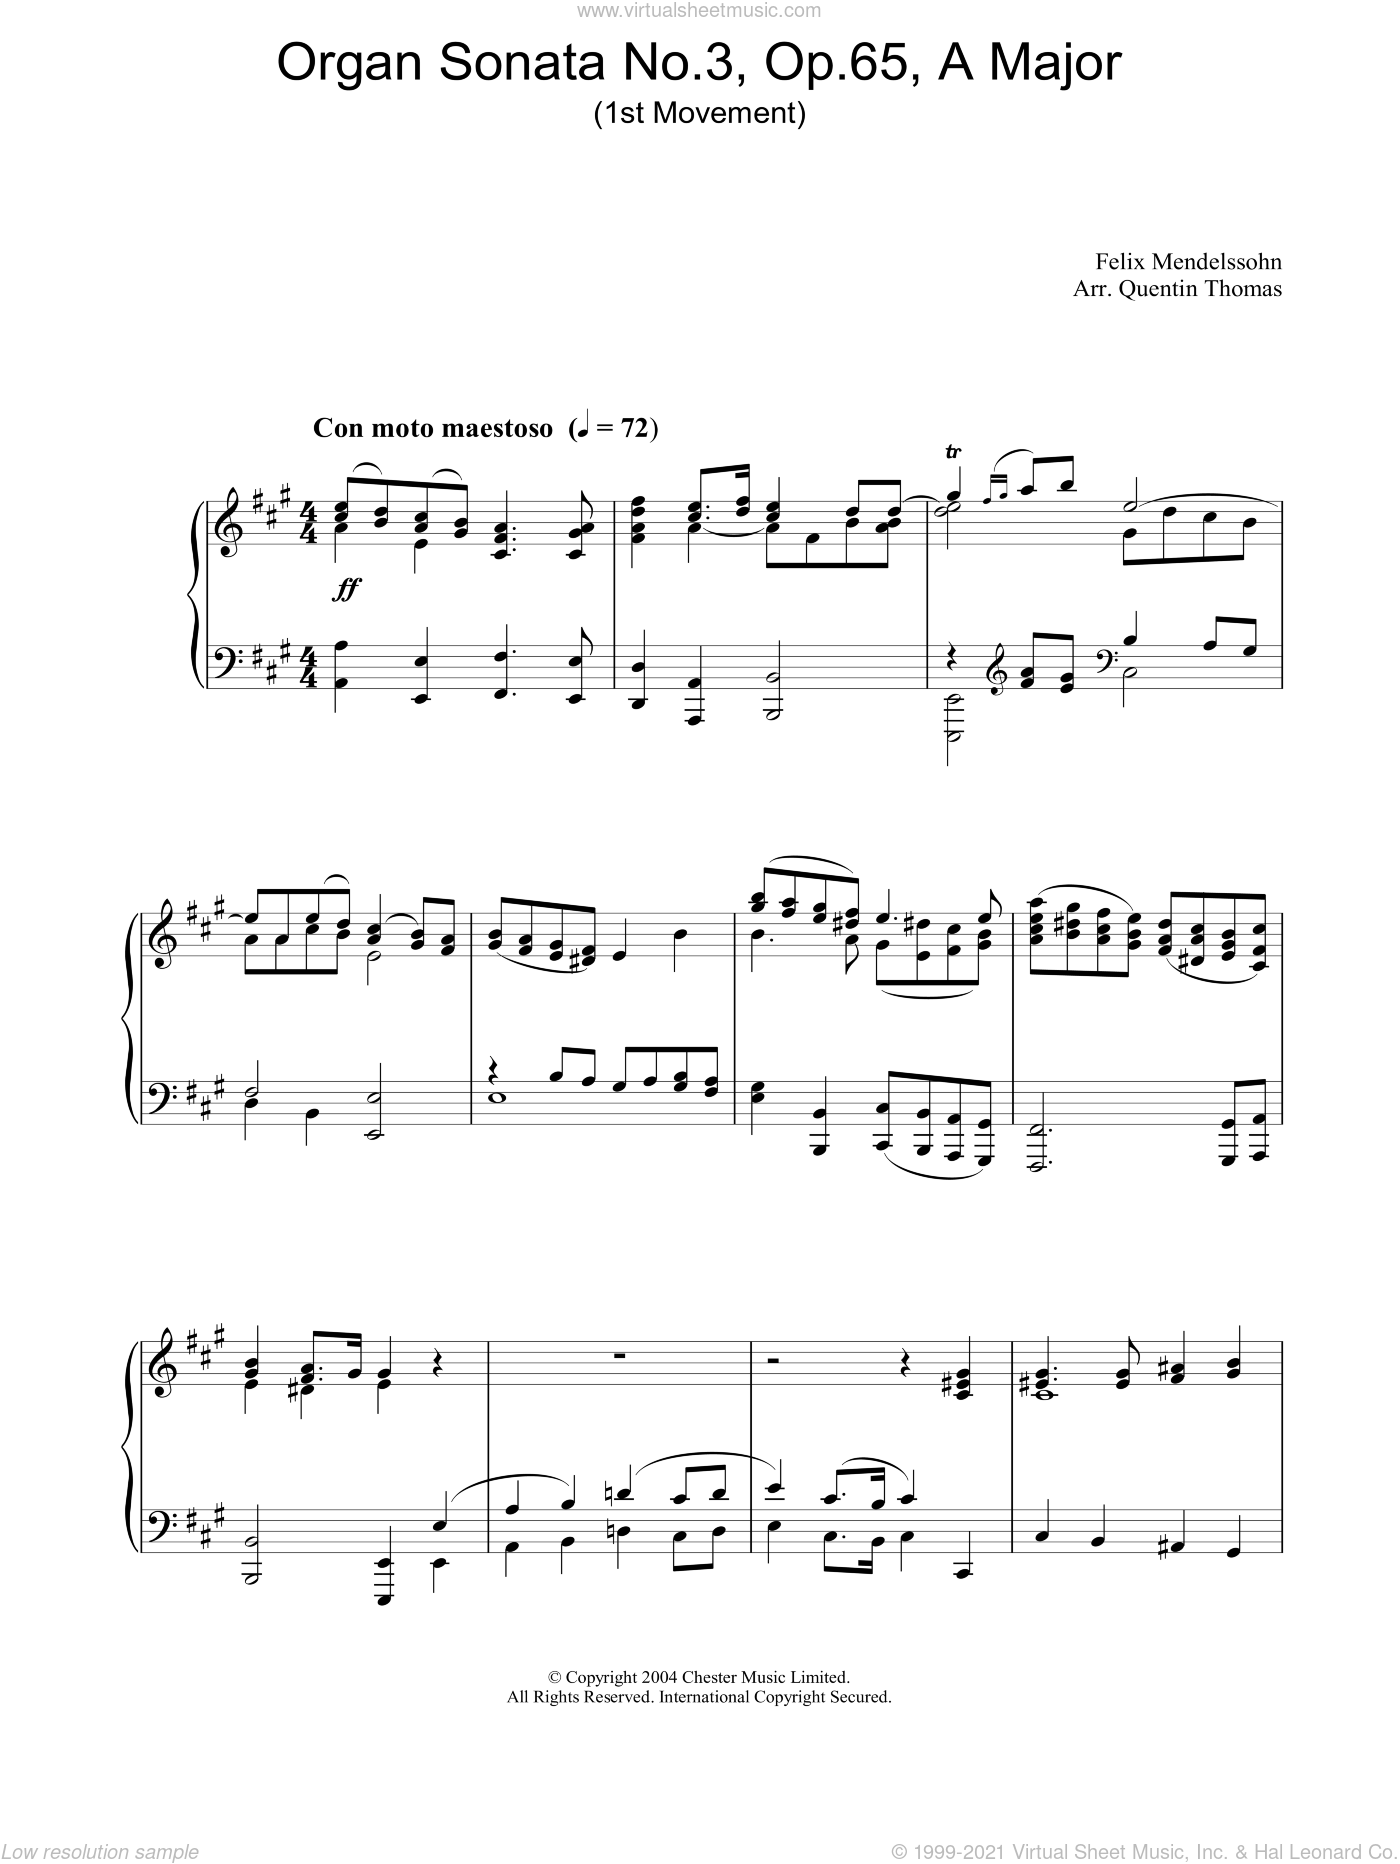 Organ Sonata No.3, Op.65, A Major sheet music for piano solo by Felix Mendelssohn-Bartholdy, classical score, intermediate skill level